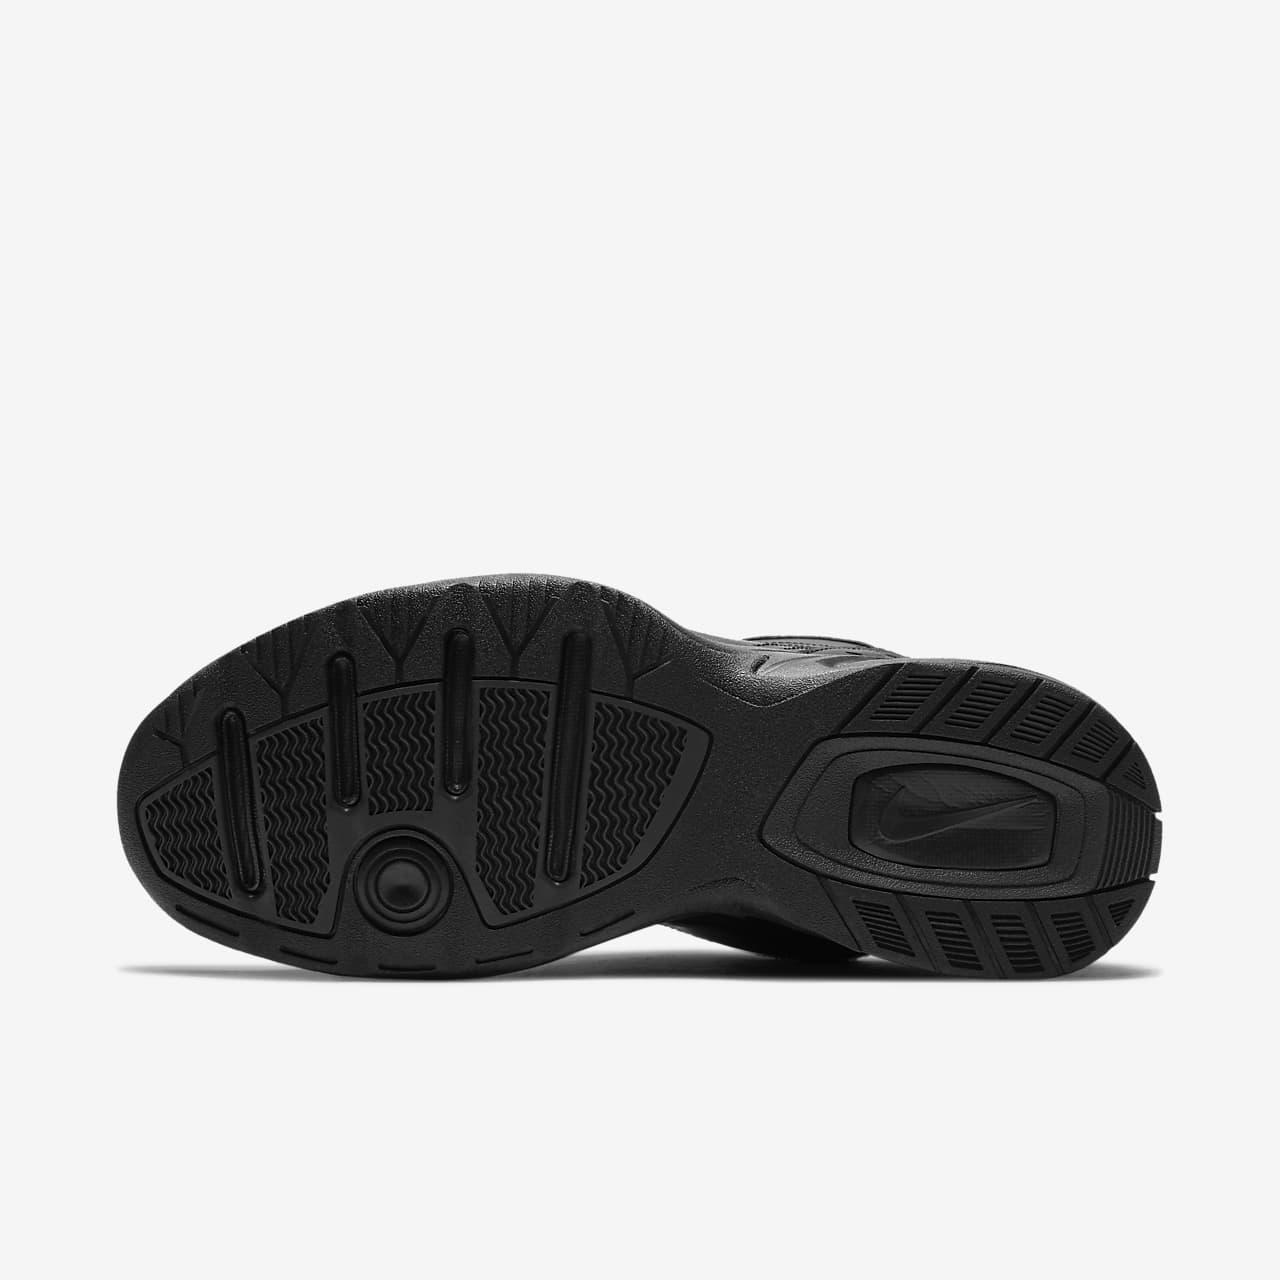 Scarpe Nike Air Basket Xxxi Bianchenererosse Uomo Basse